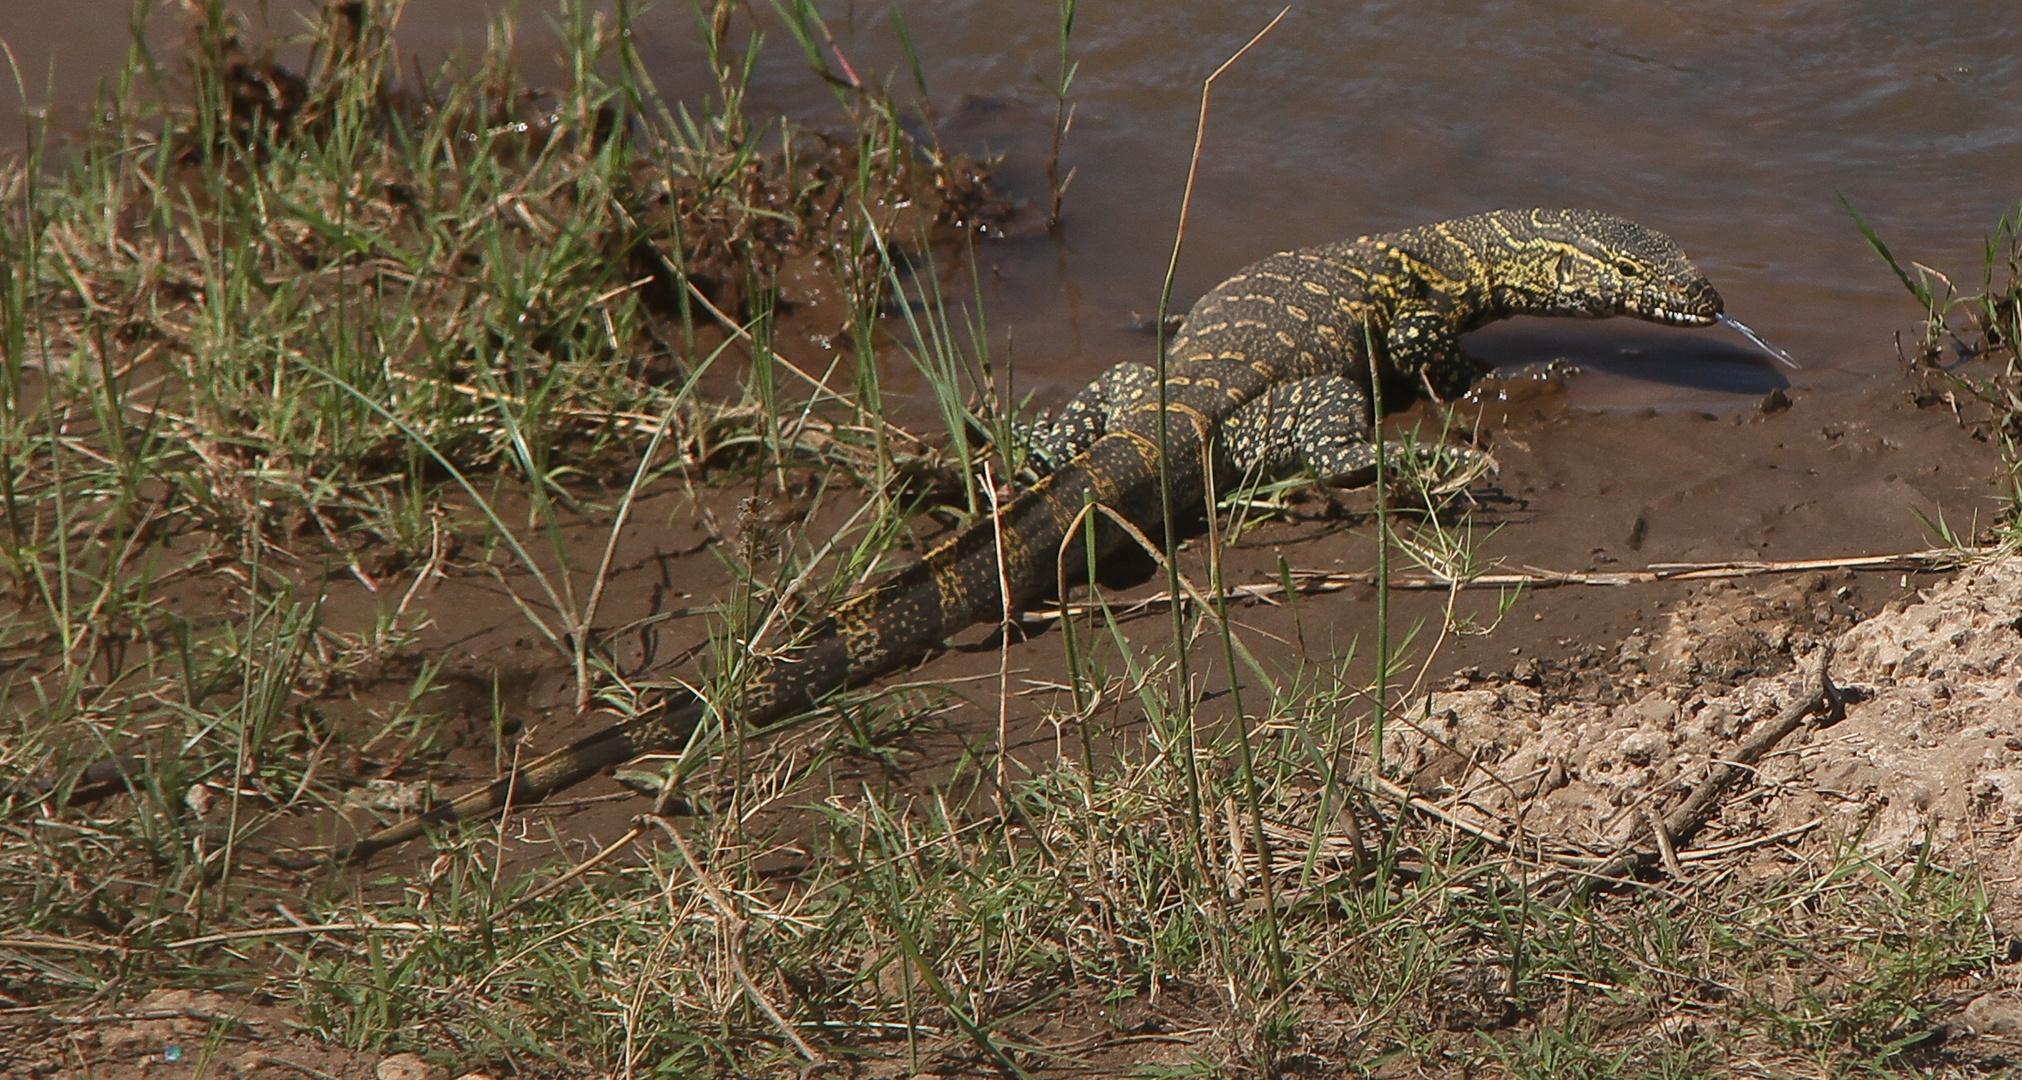 Nilwaran am Ufer des Mara-Rivers